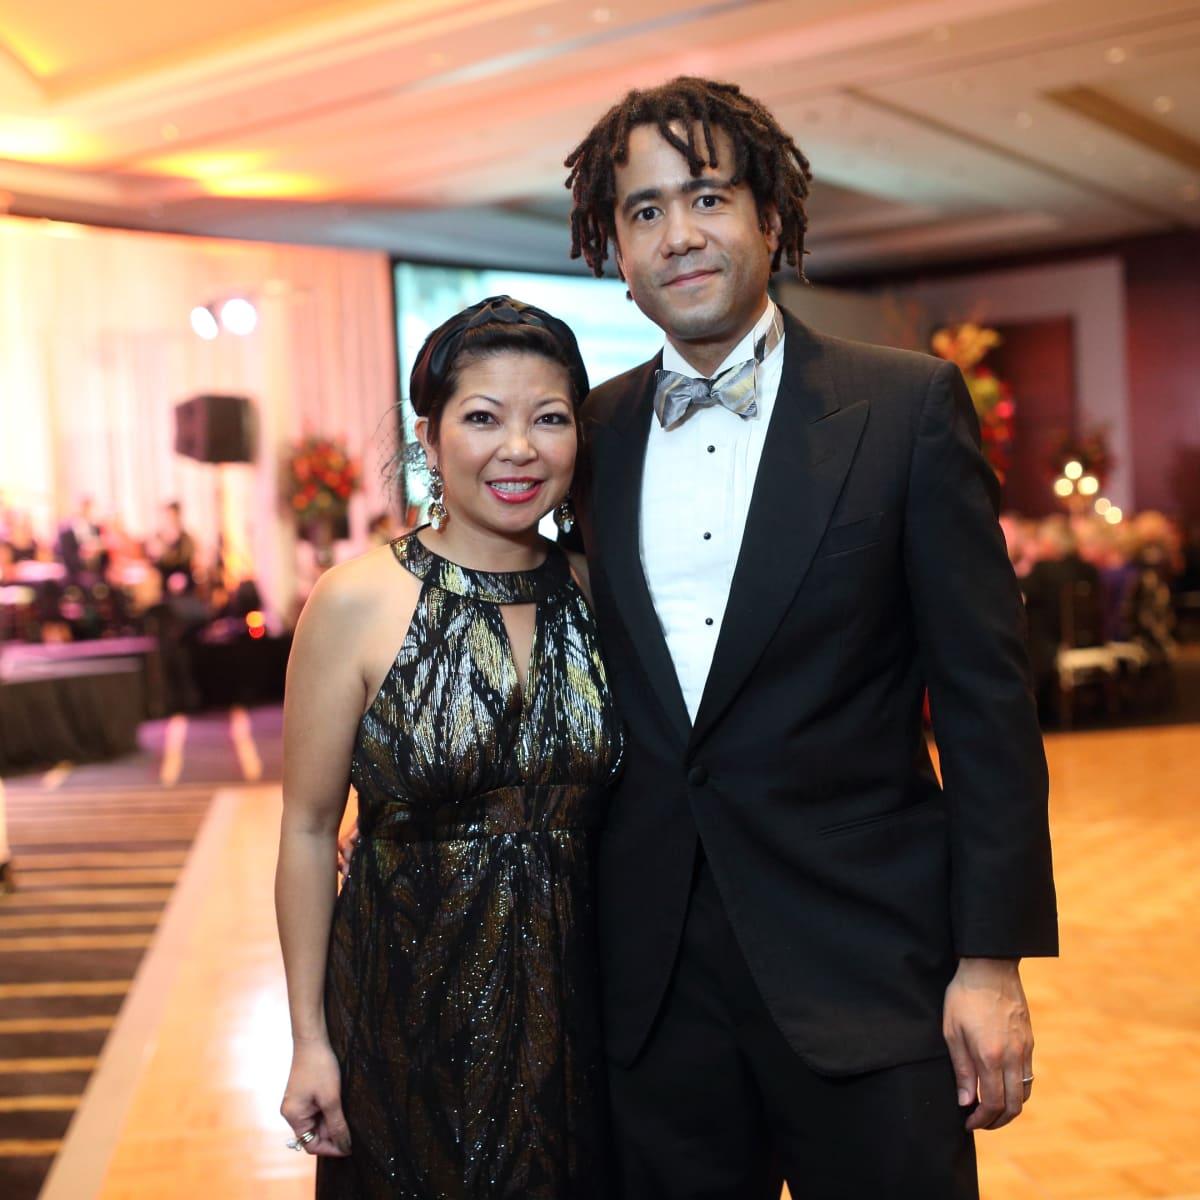 News, Shelby, Women's Home gala, Nov. 2015, Tina Zulu, Josh Zulu